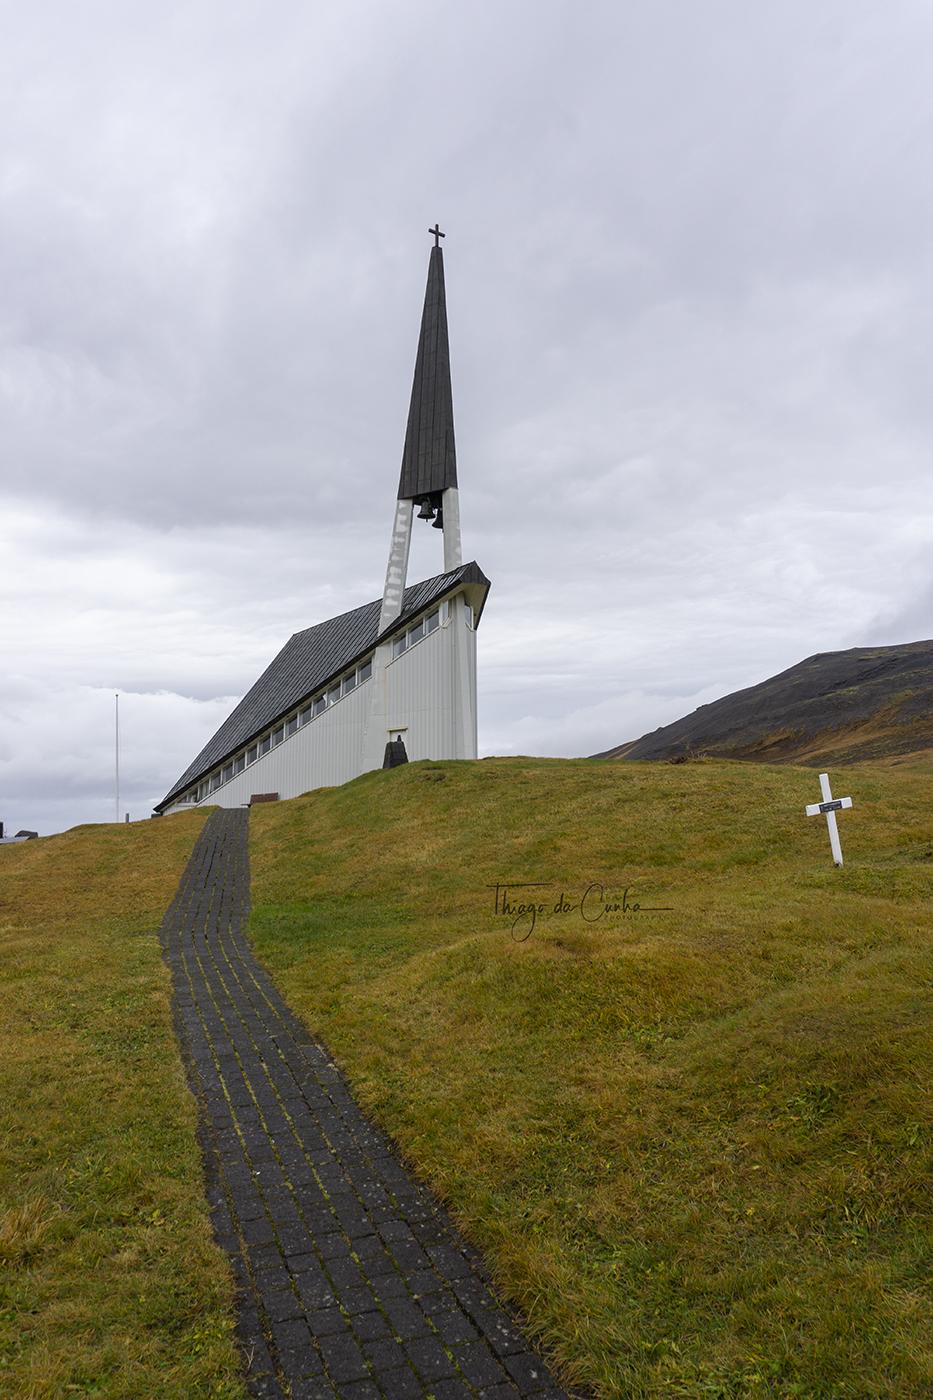 fotografo de interiores islandia.jpg